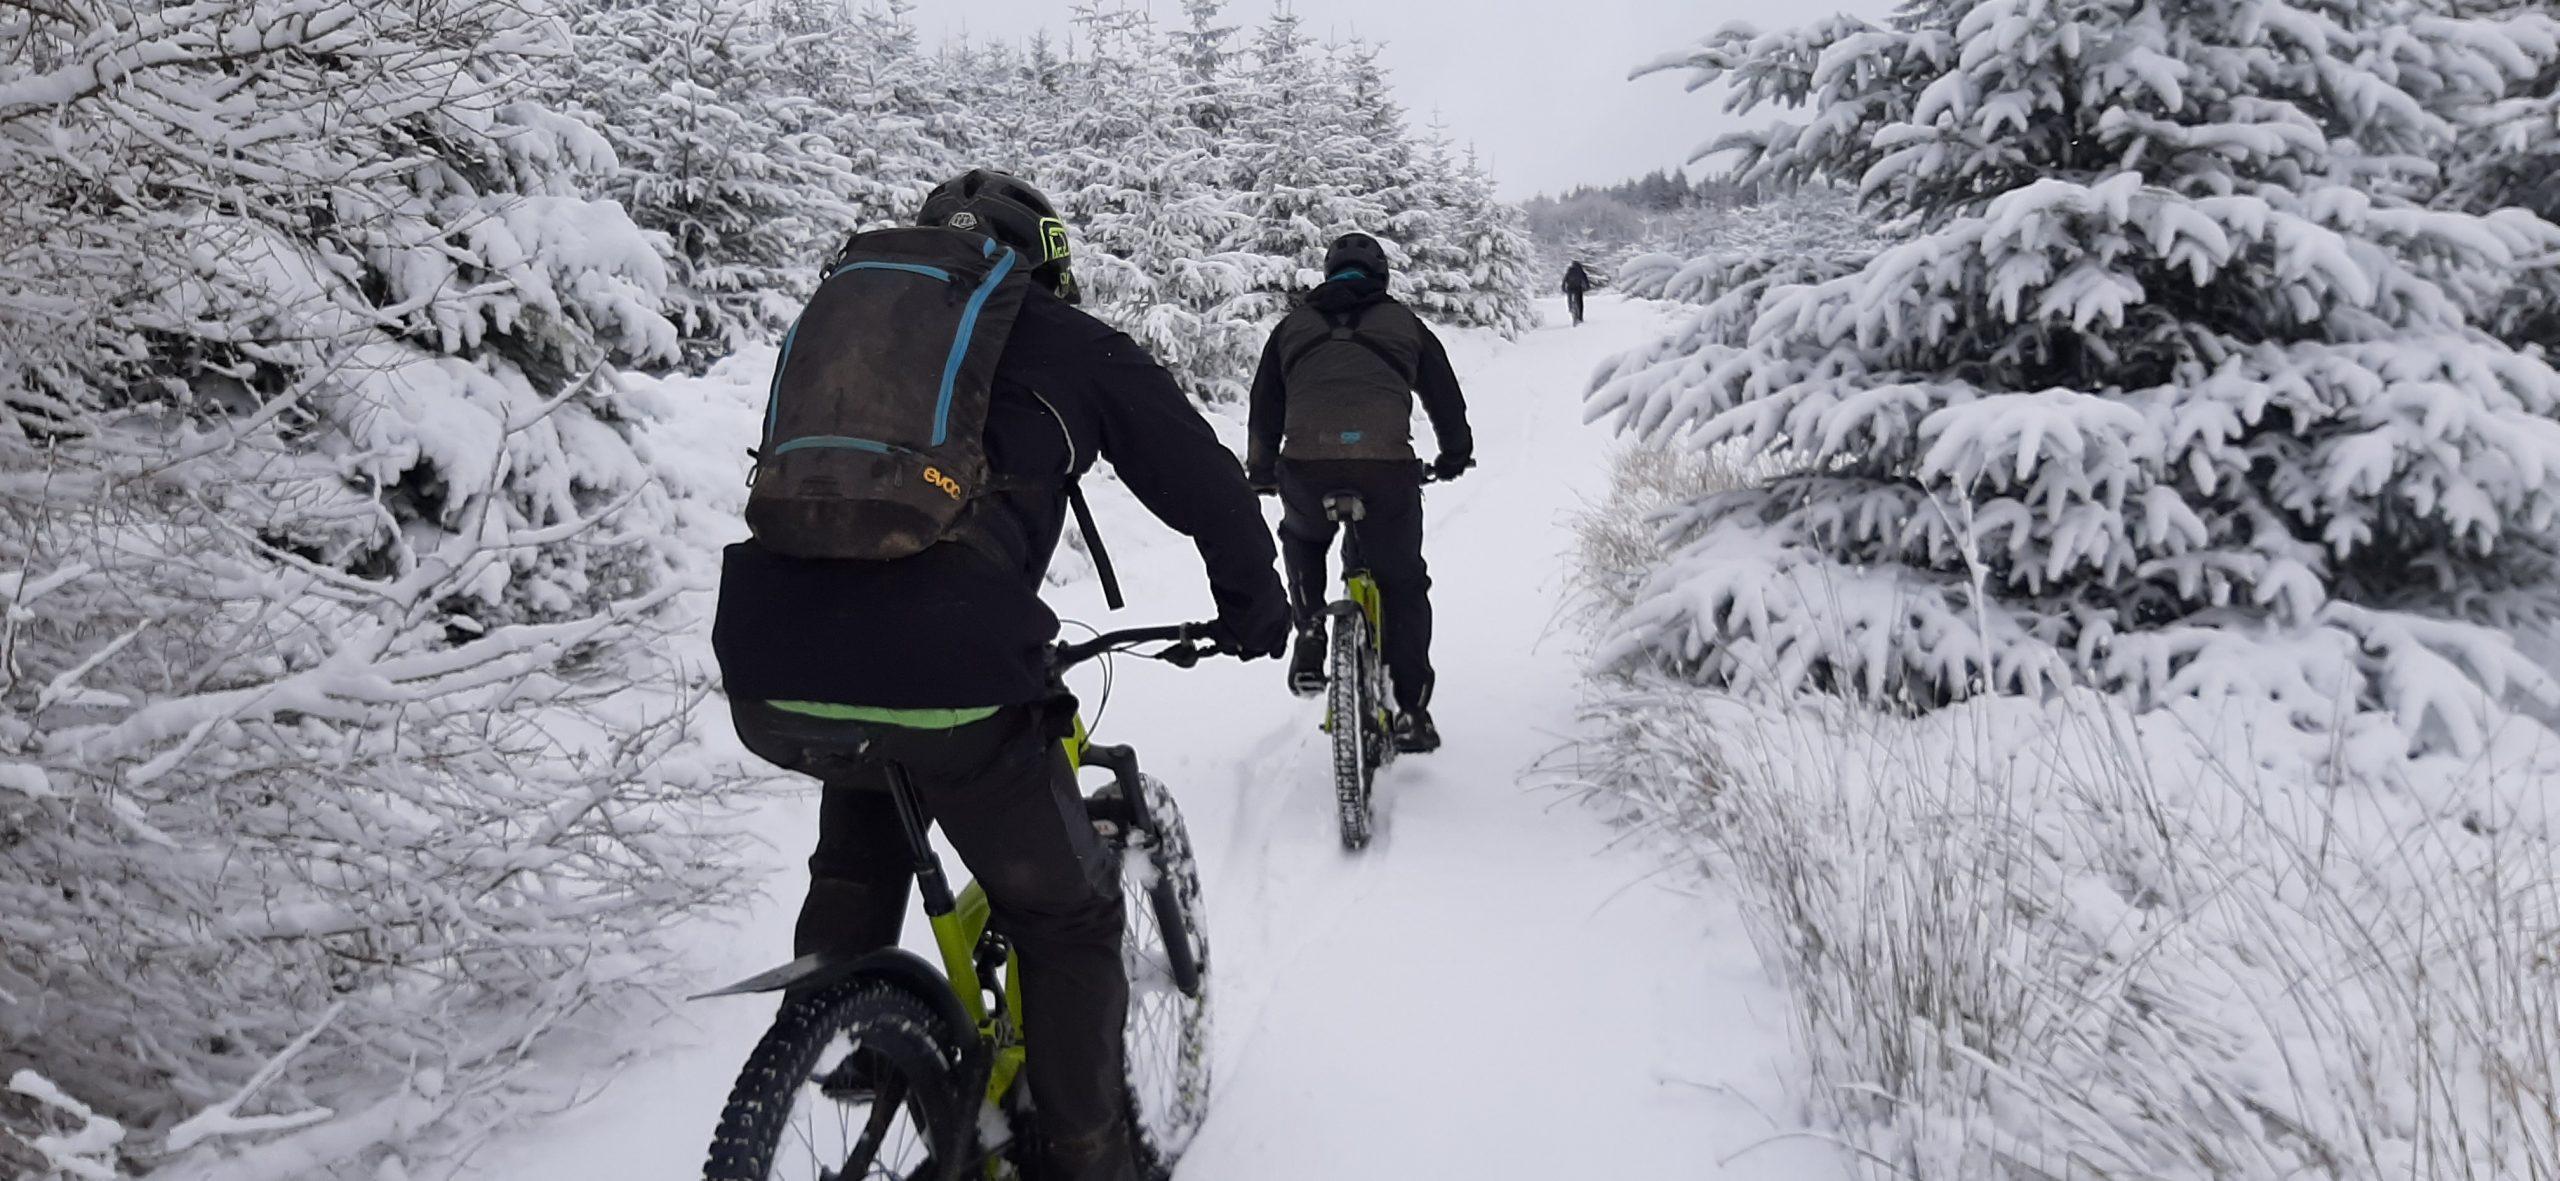 MTB, Mountain biking